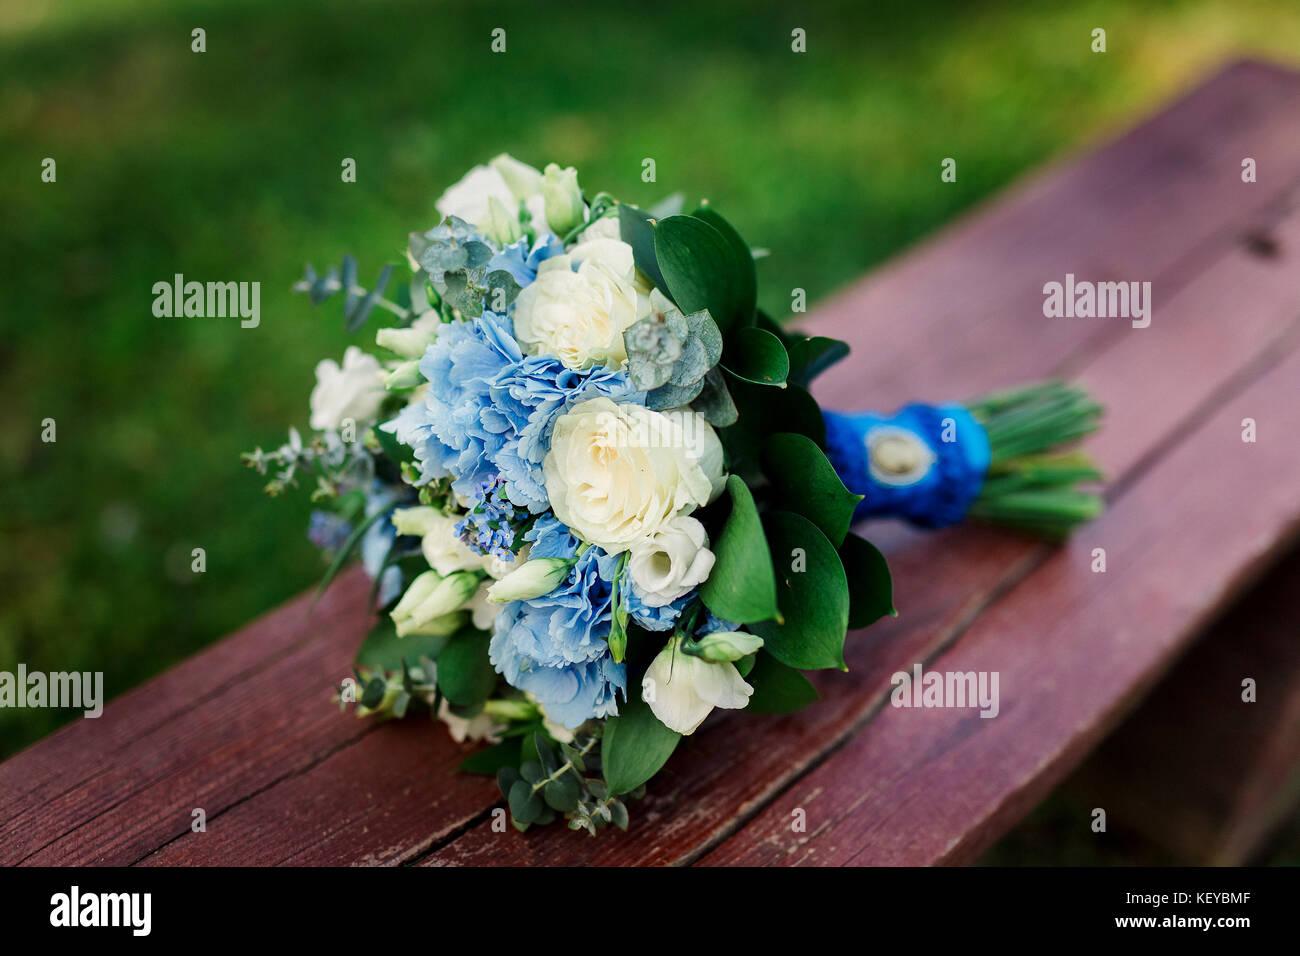 Beautiful blue and white fresh flowers wedding bouquet wedding beautiful blue and white fresh flowers wedding bouquet wedding details izmirmasajfo